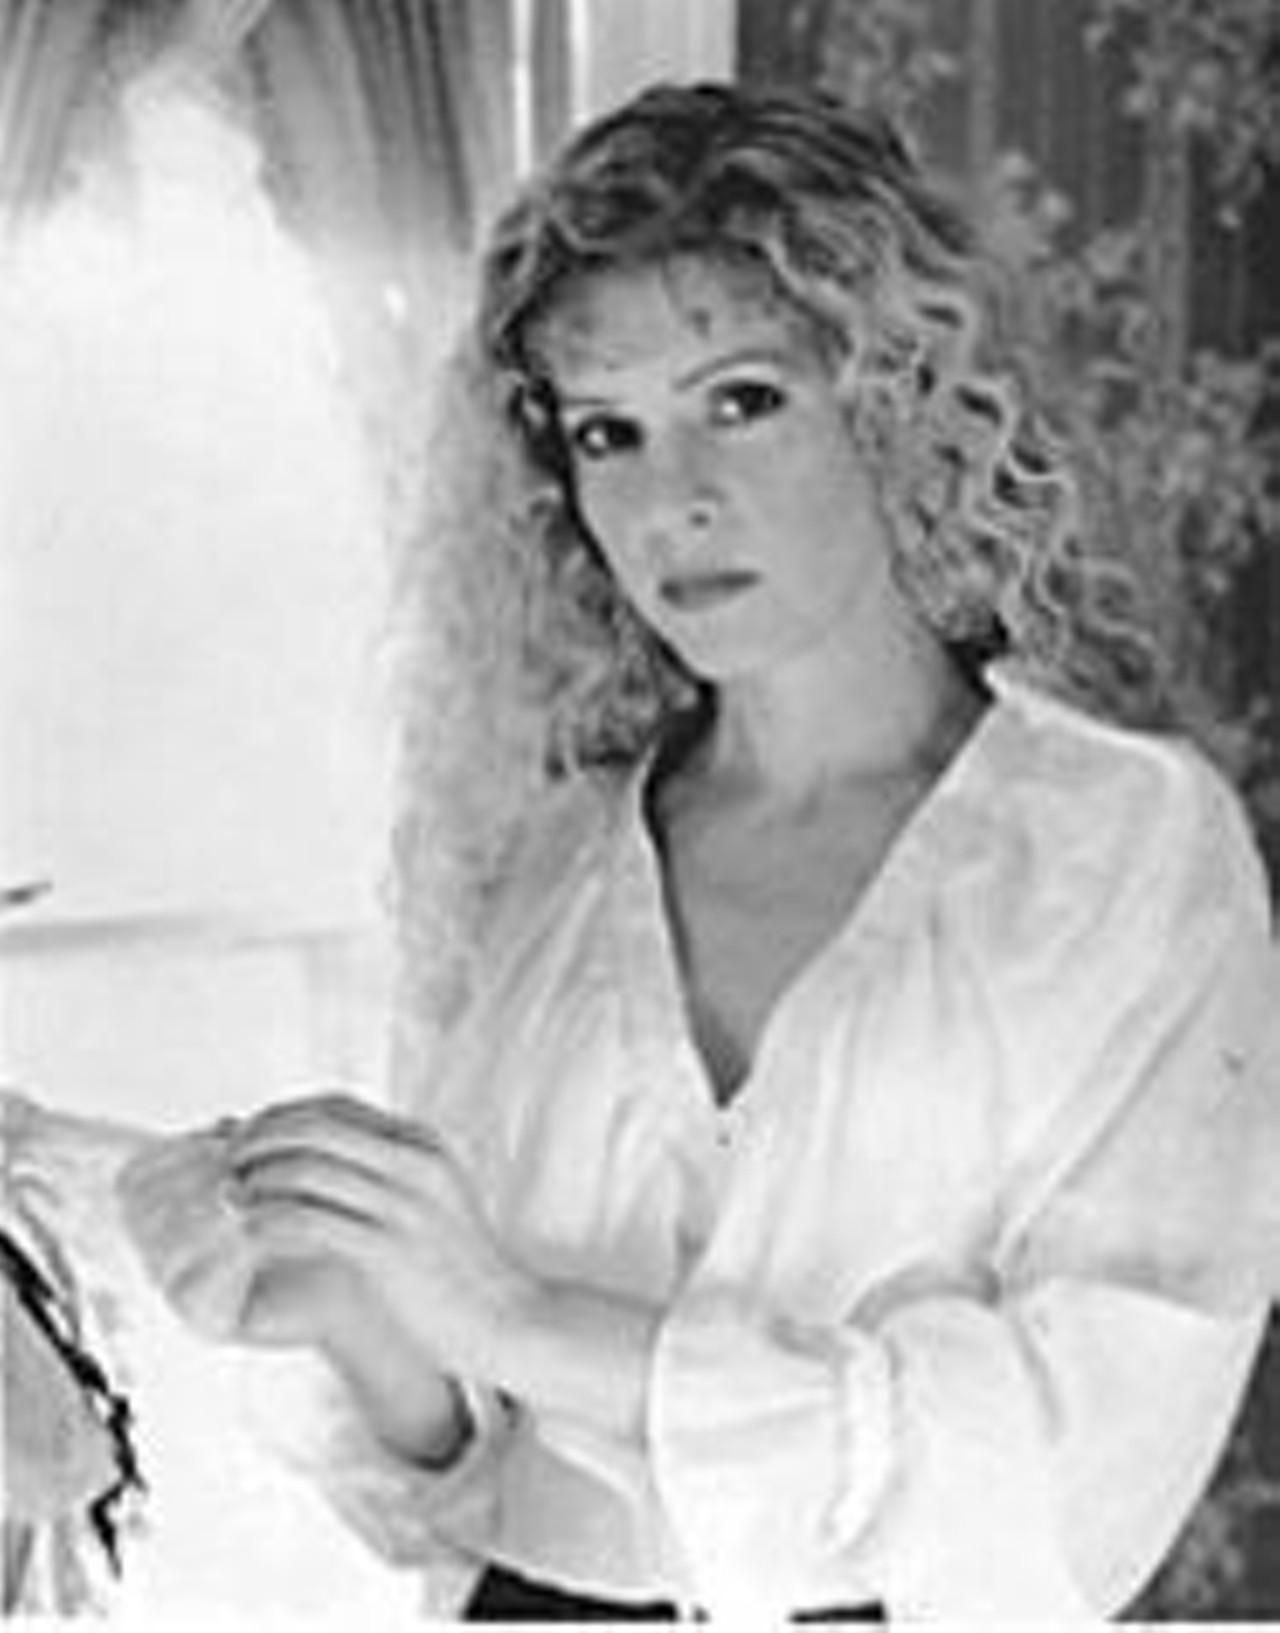 Ara Celi,Alexandra Hedison Sex picture Margaret Hamilton (actress),Diva Montelaba (b. 1991)